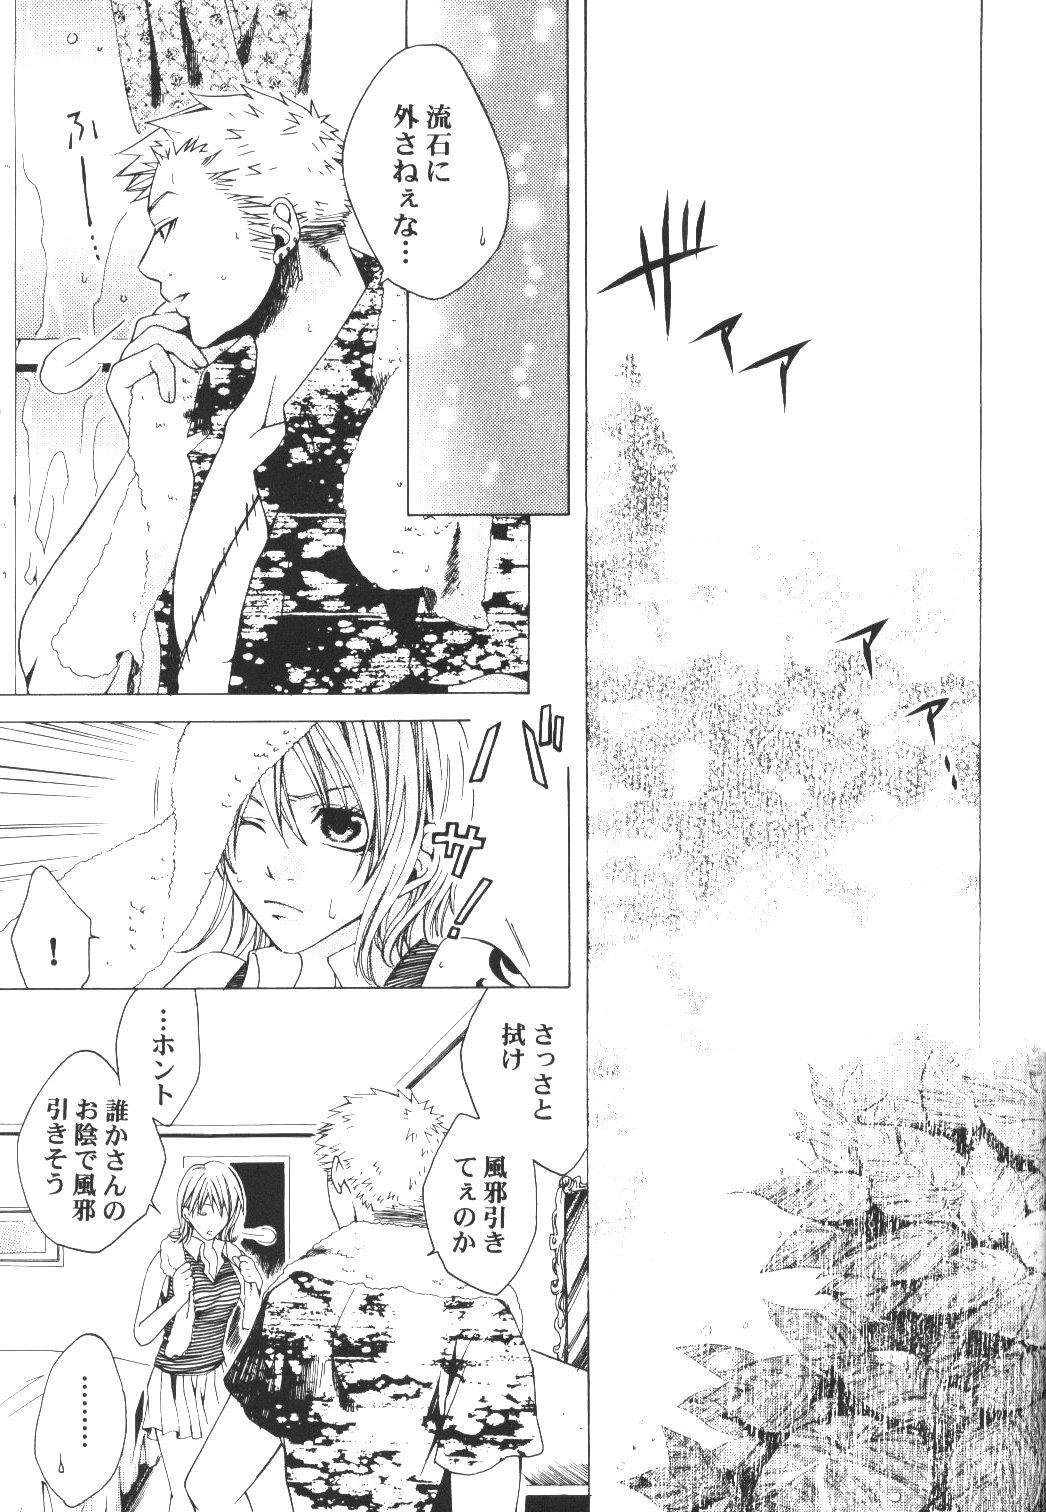 Yume Ichiya 2 85